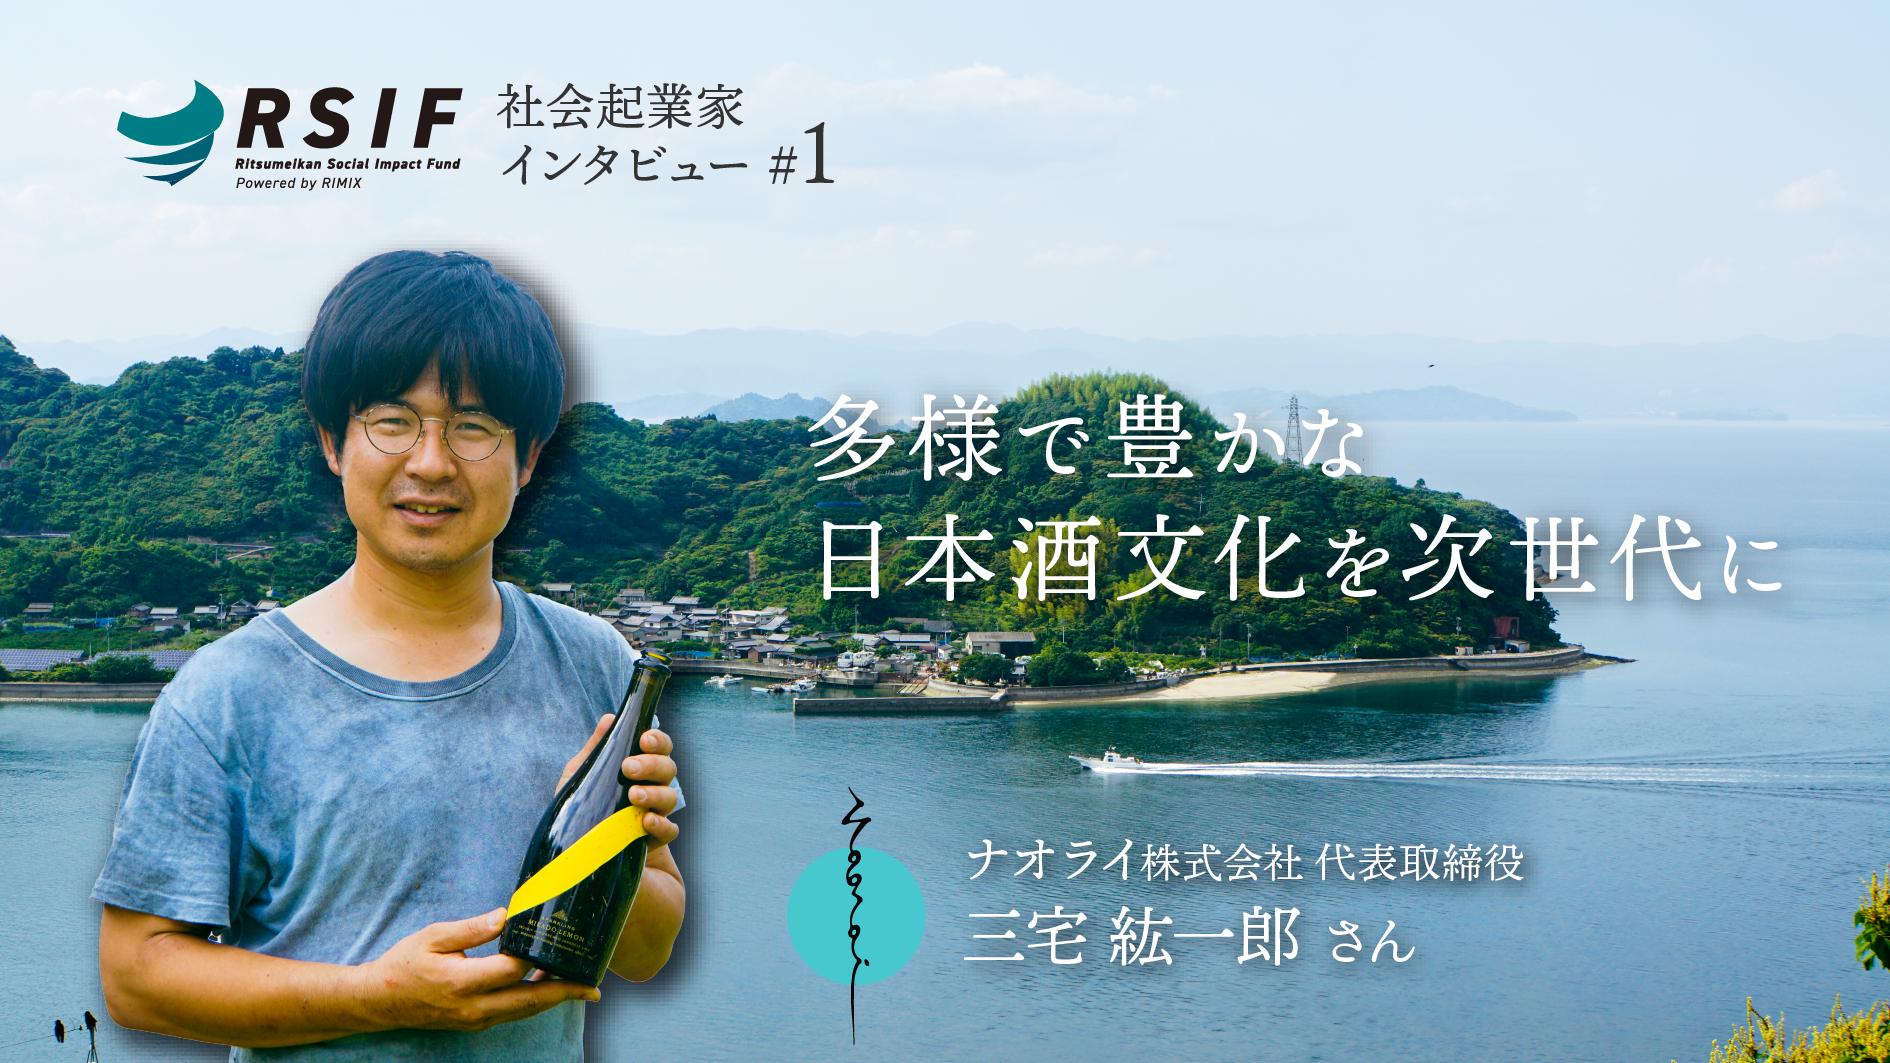 RSIF社会起業家インタビュー#1:ナオライ株式会社・三宅紘一郎さん「多様で豊かな日本酒文化を次世代に」